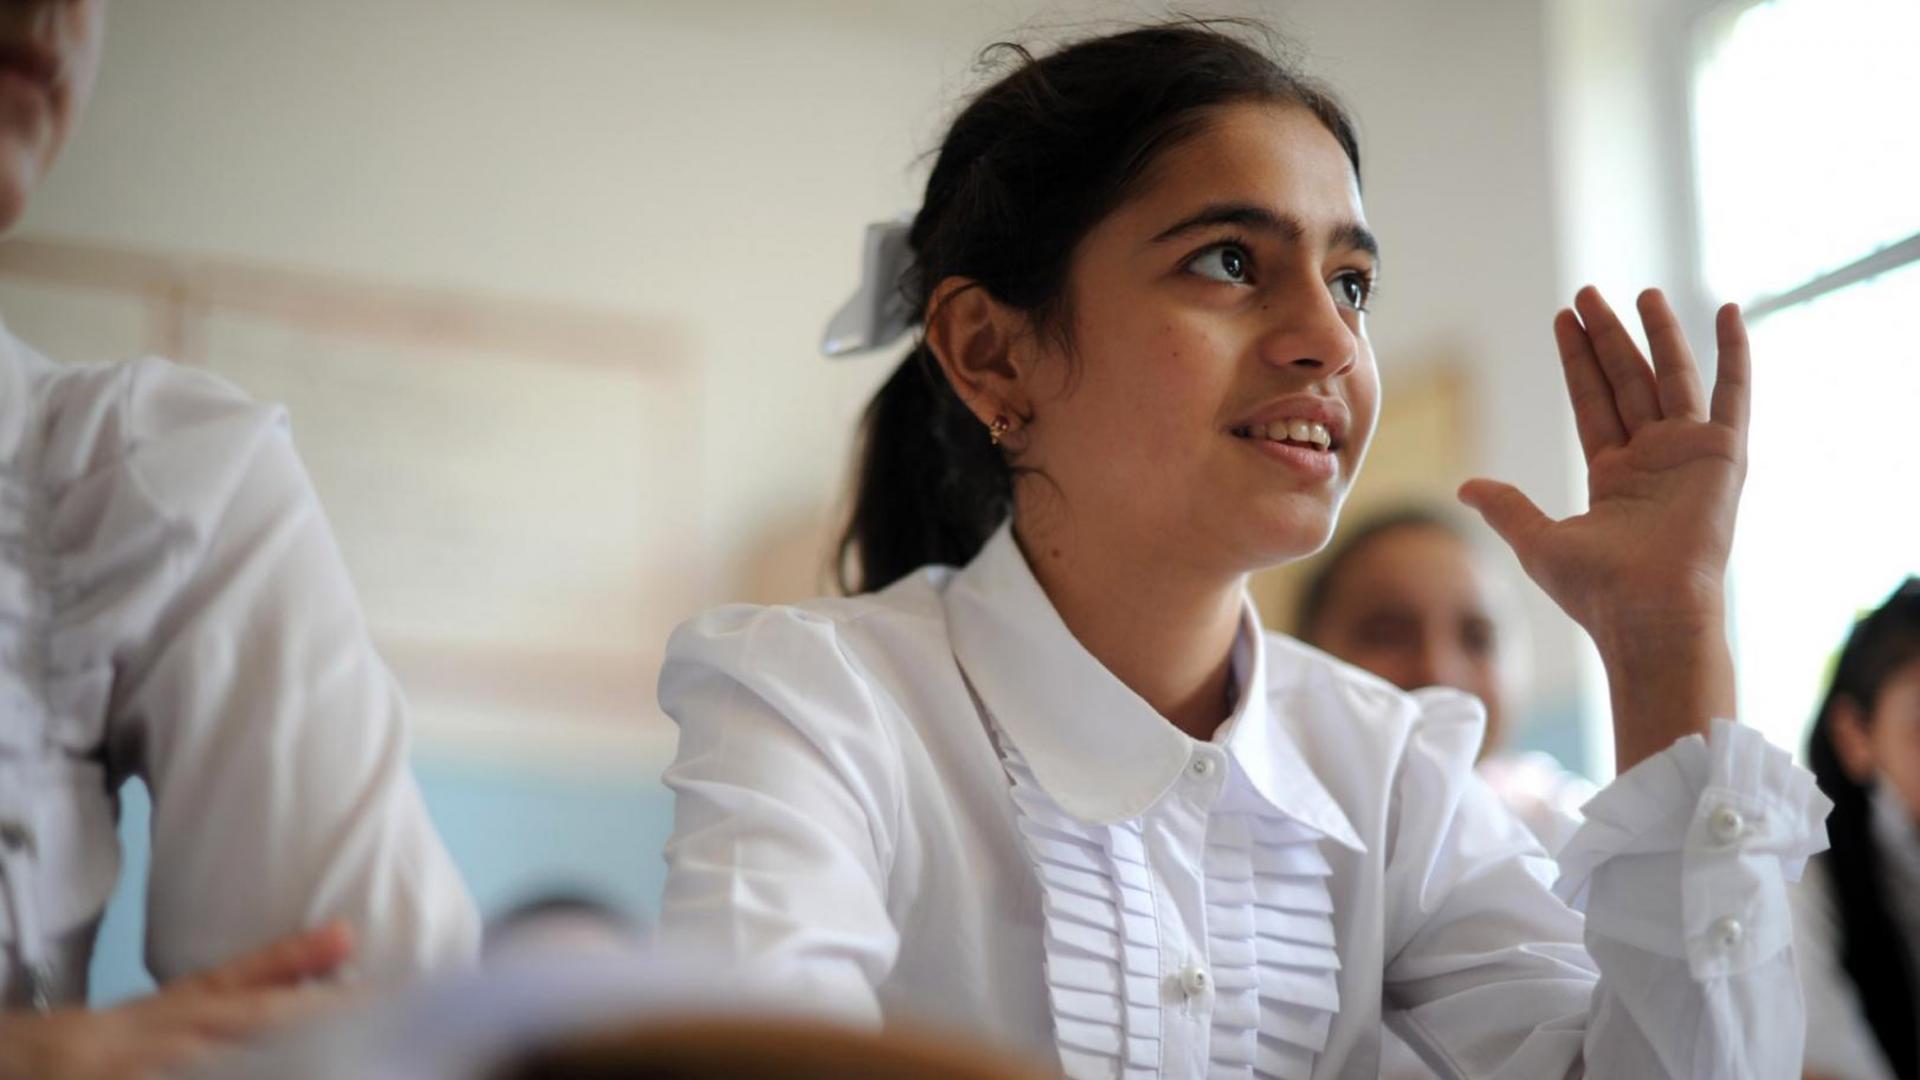 Young girl in school